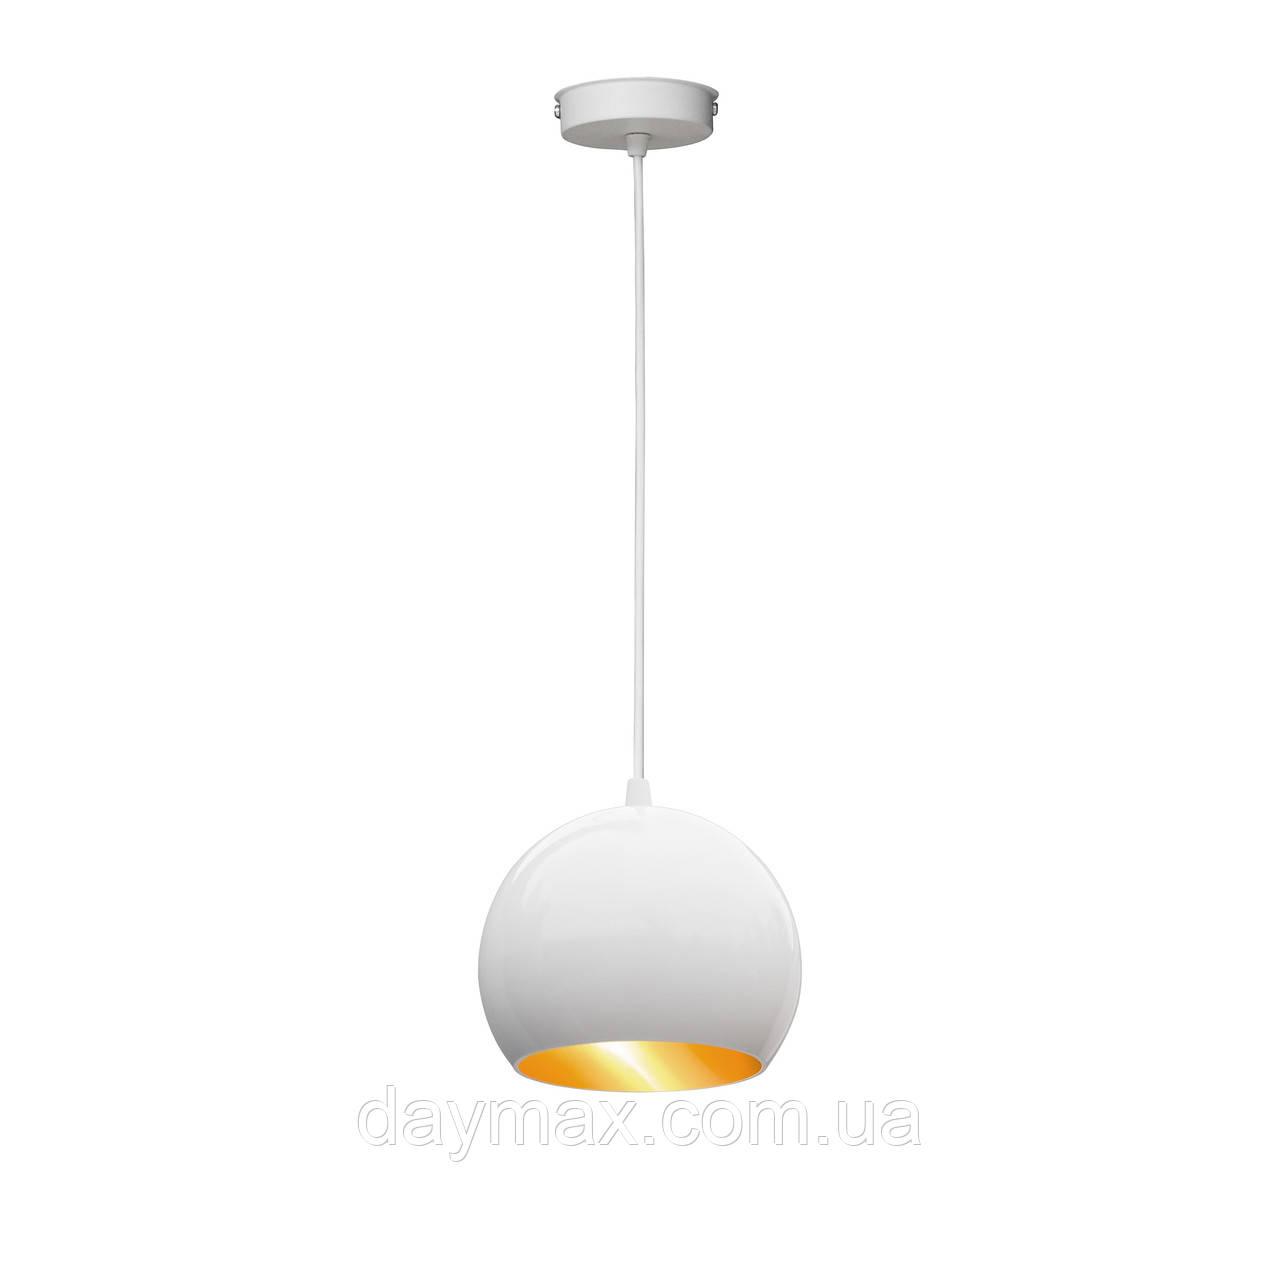 Светильник подвесной Msk Electric  Шар  NL 1512 WH+GD ширина 150mm